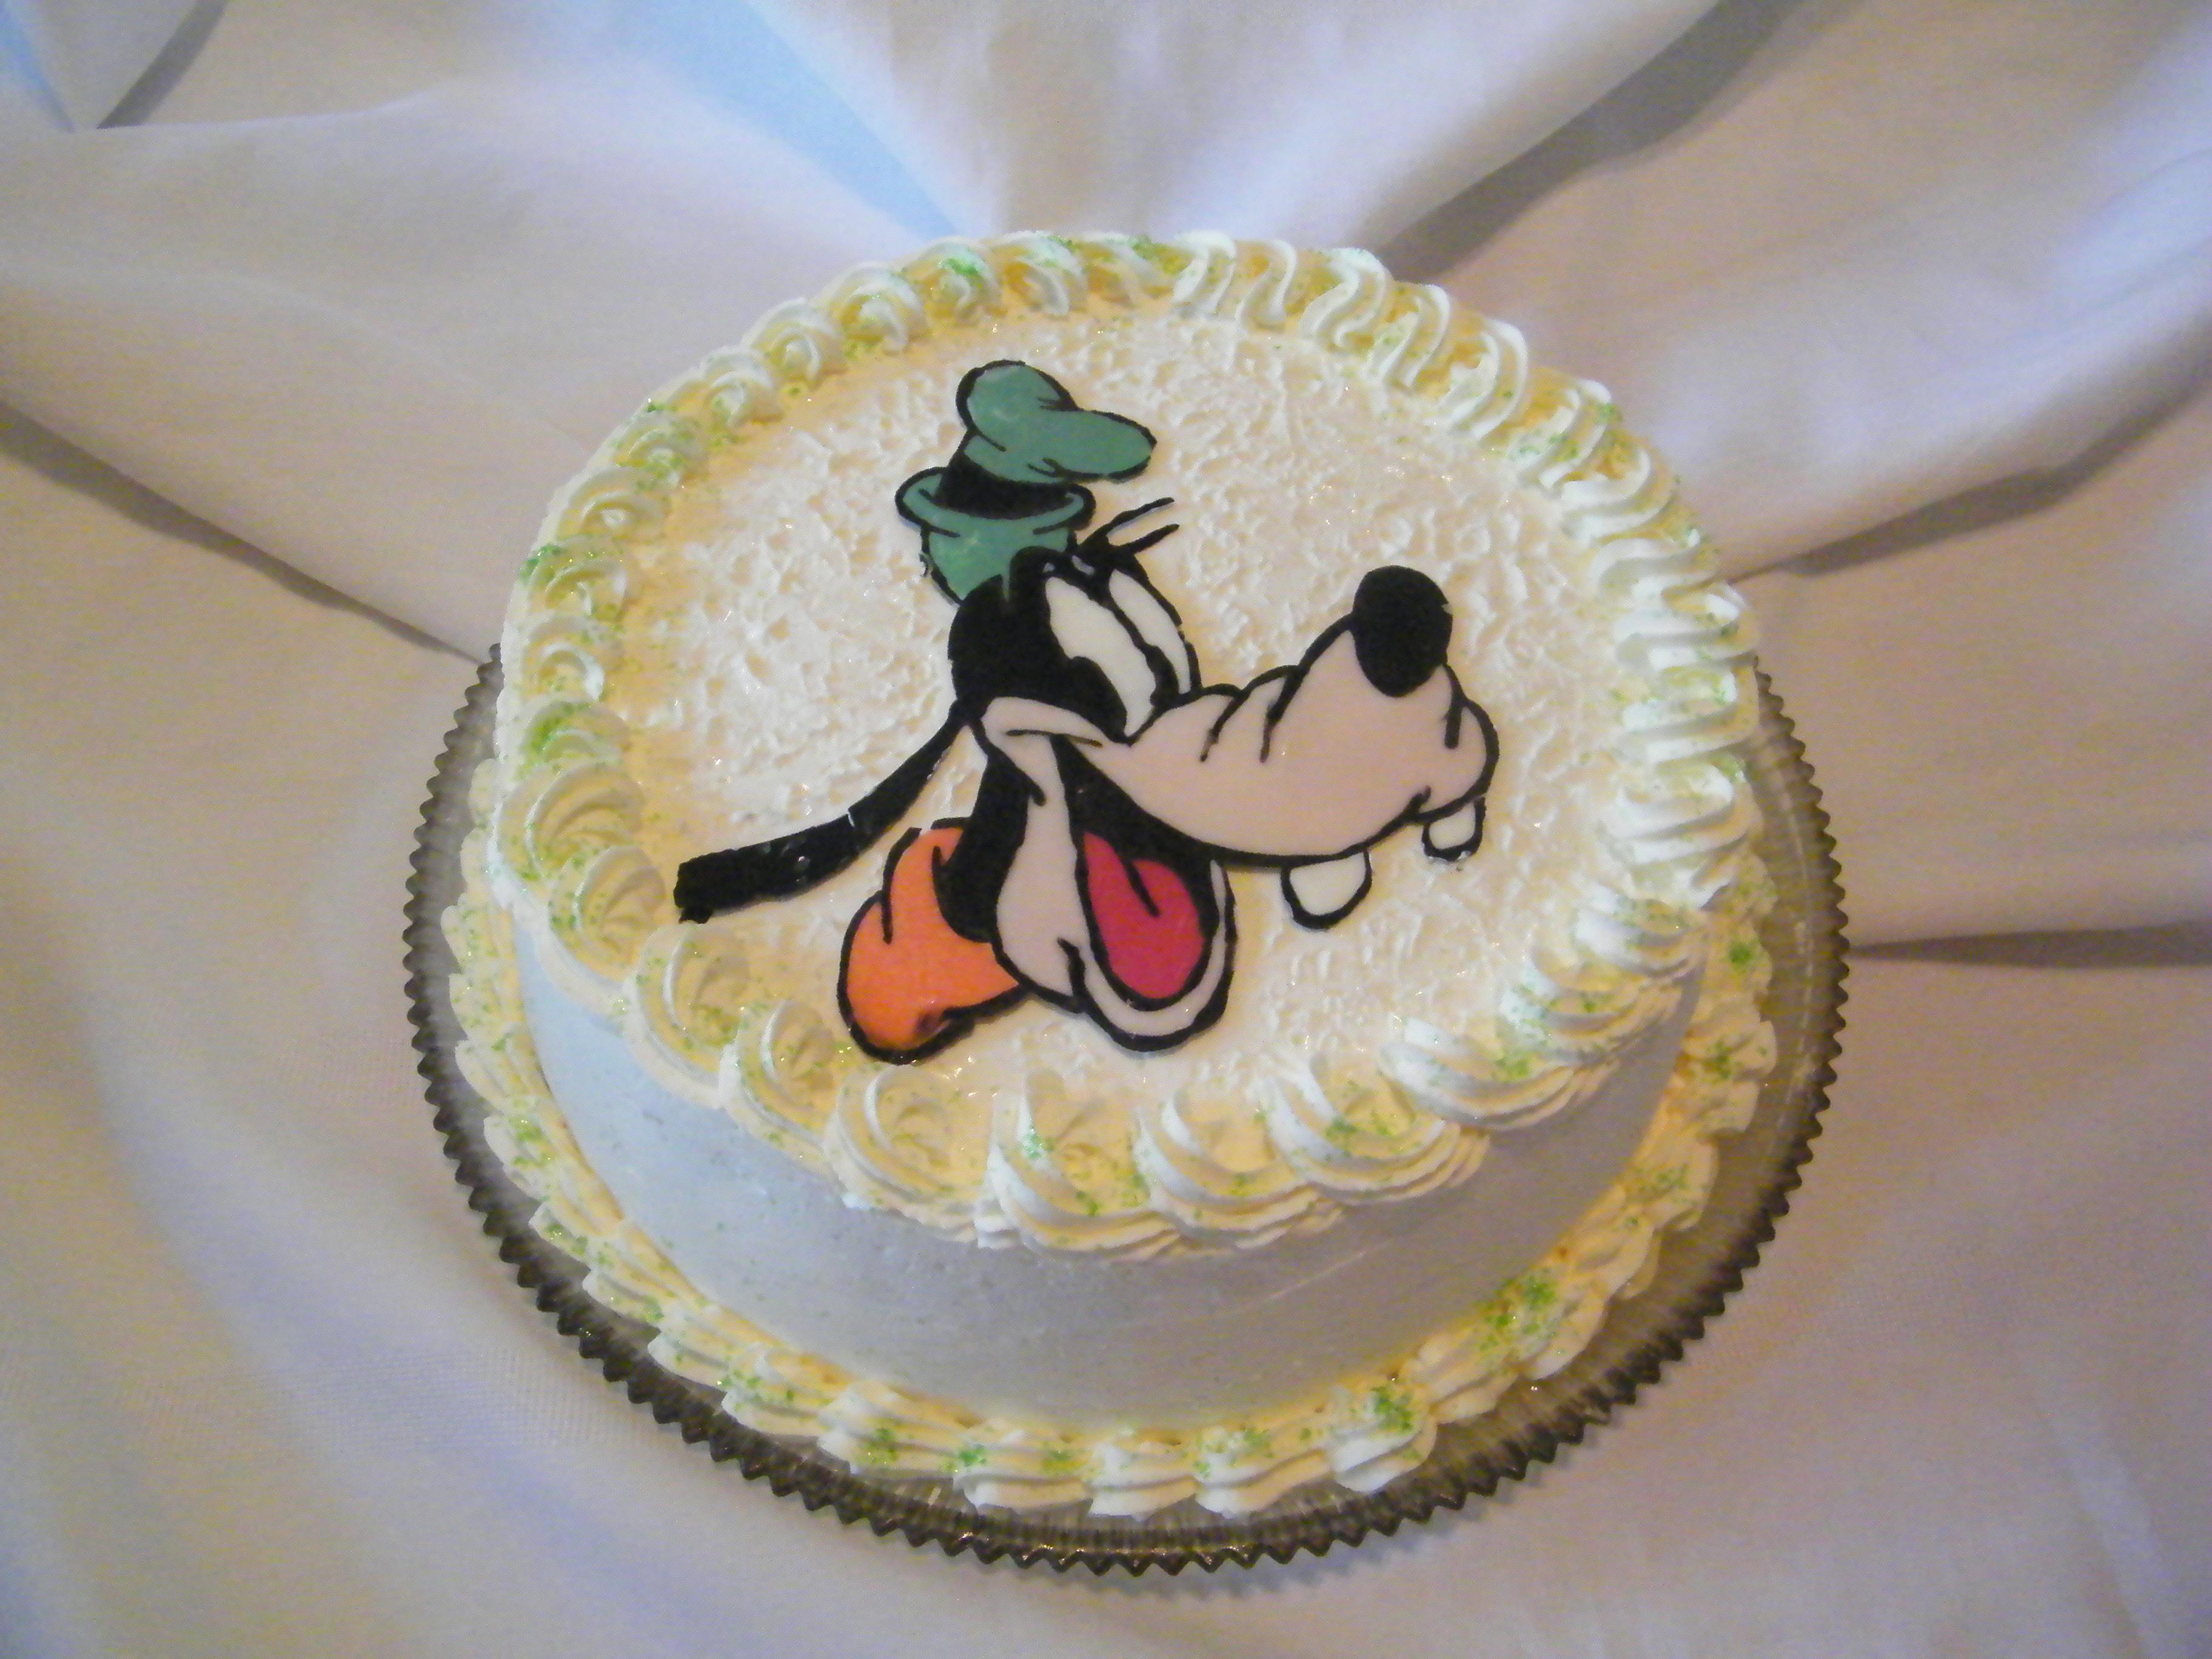 Goofy Cakes Decoration Ideas